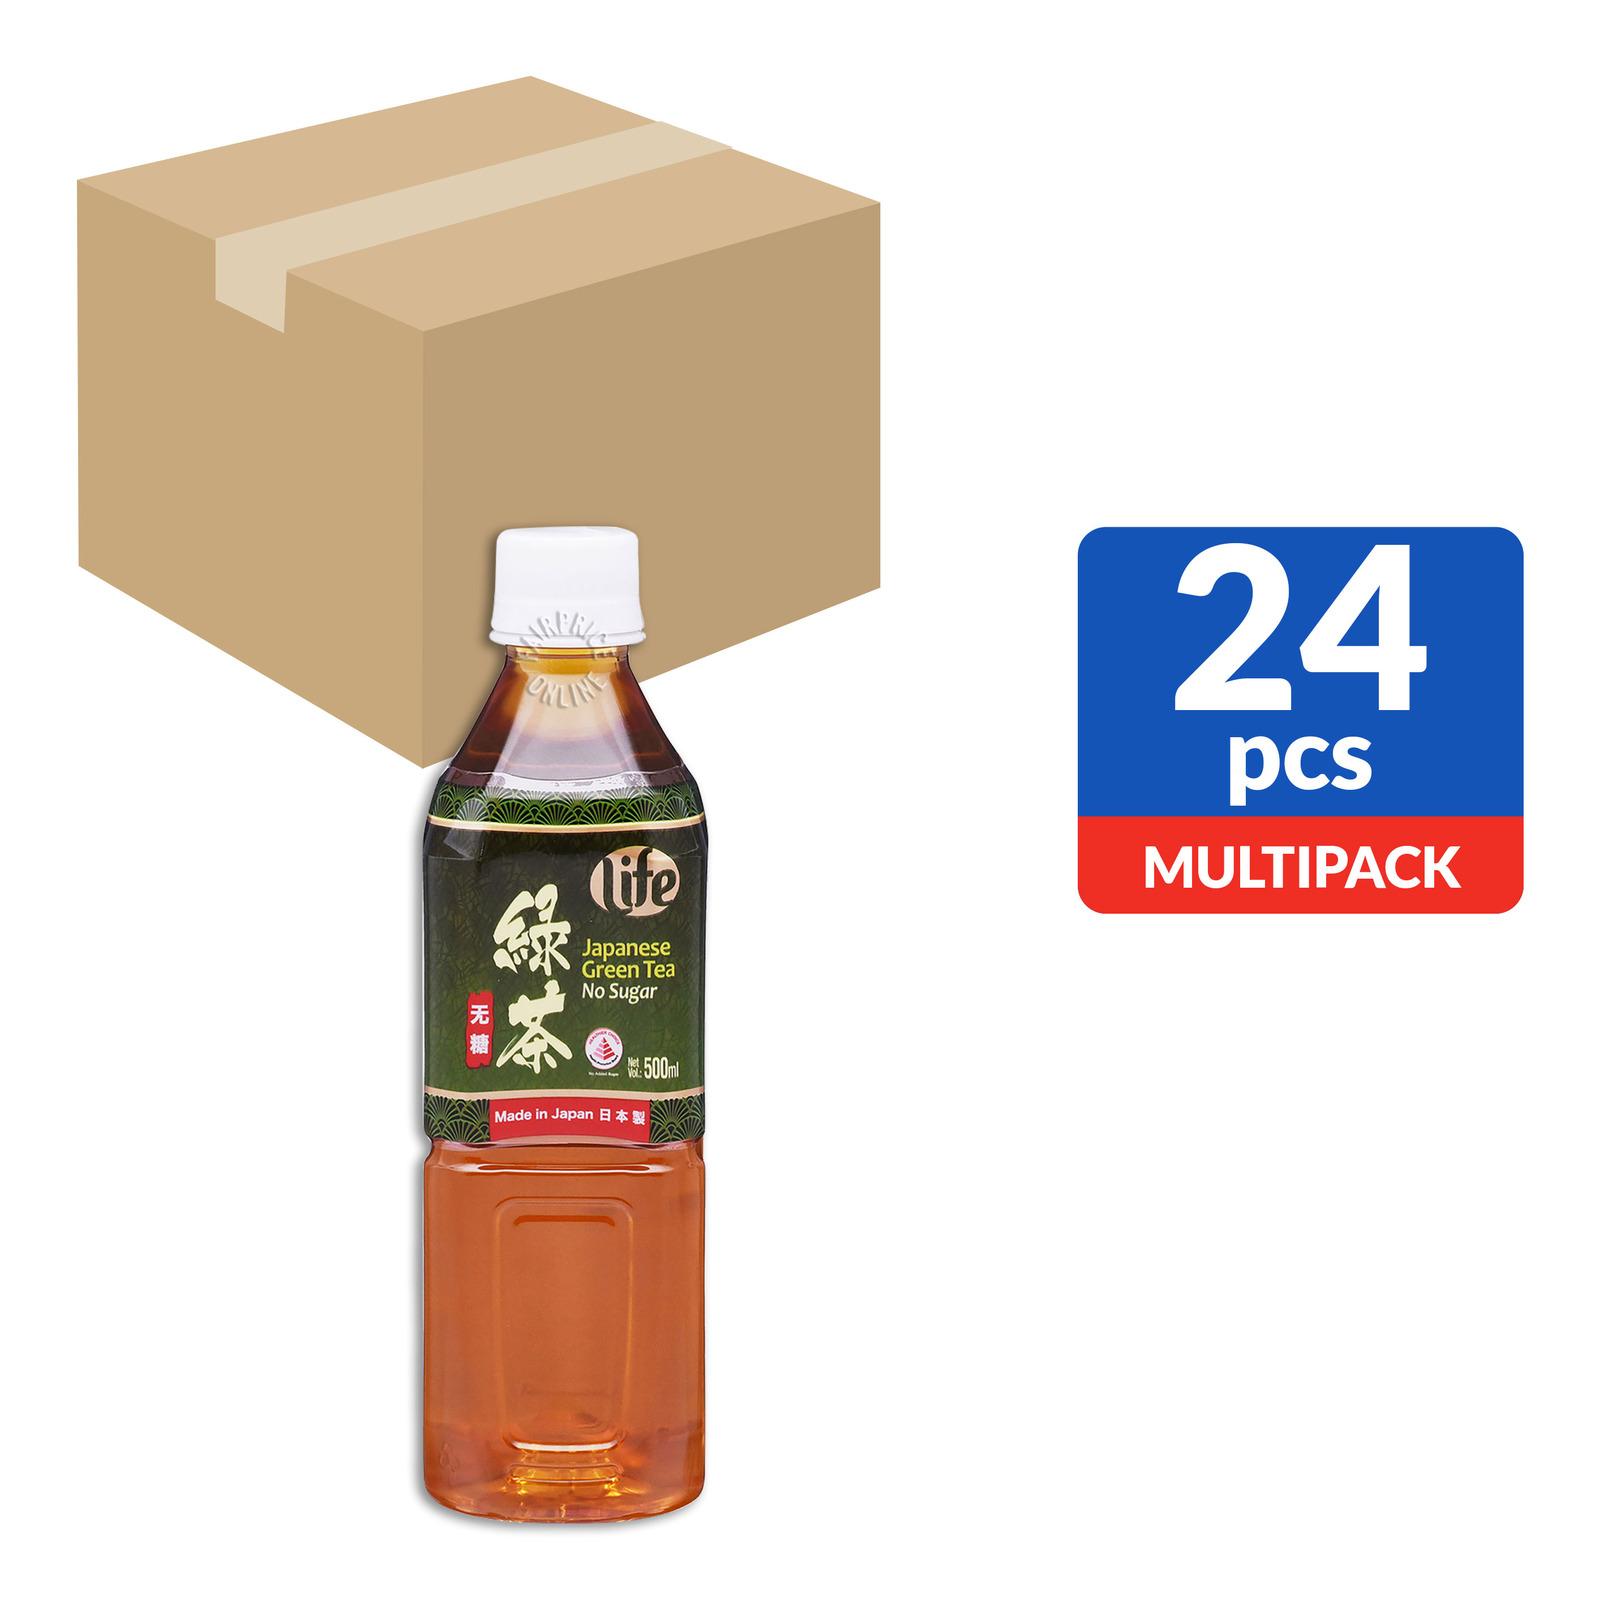 #Life Bottle Drink - Japanese Green Tea (No Sugar)